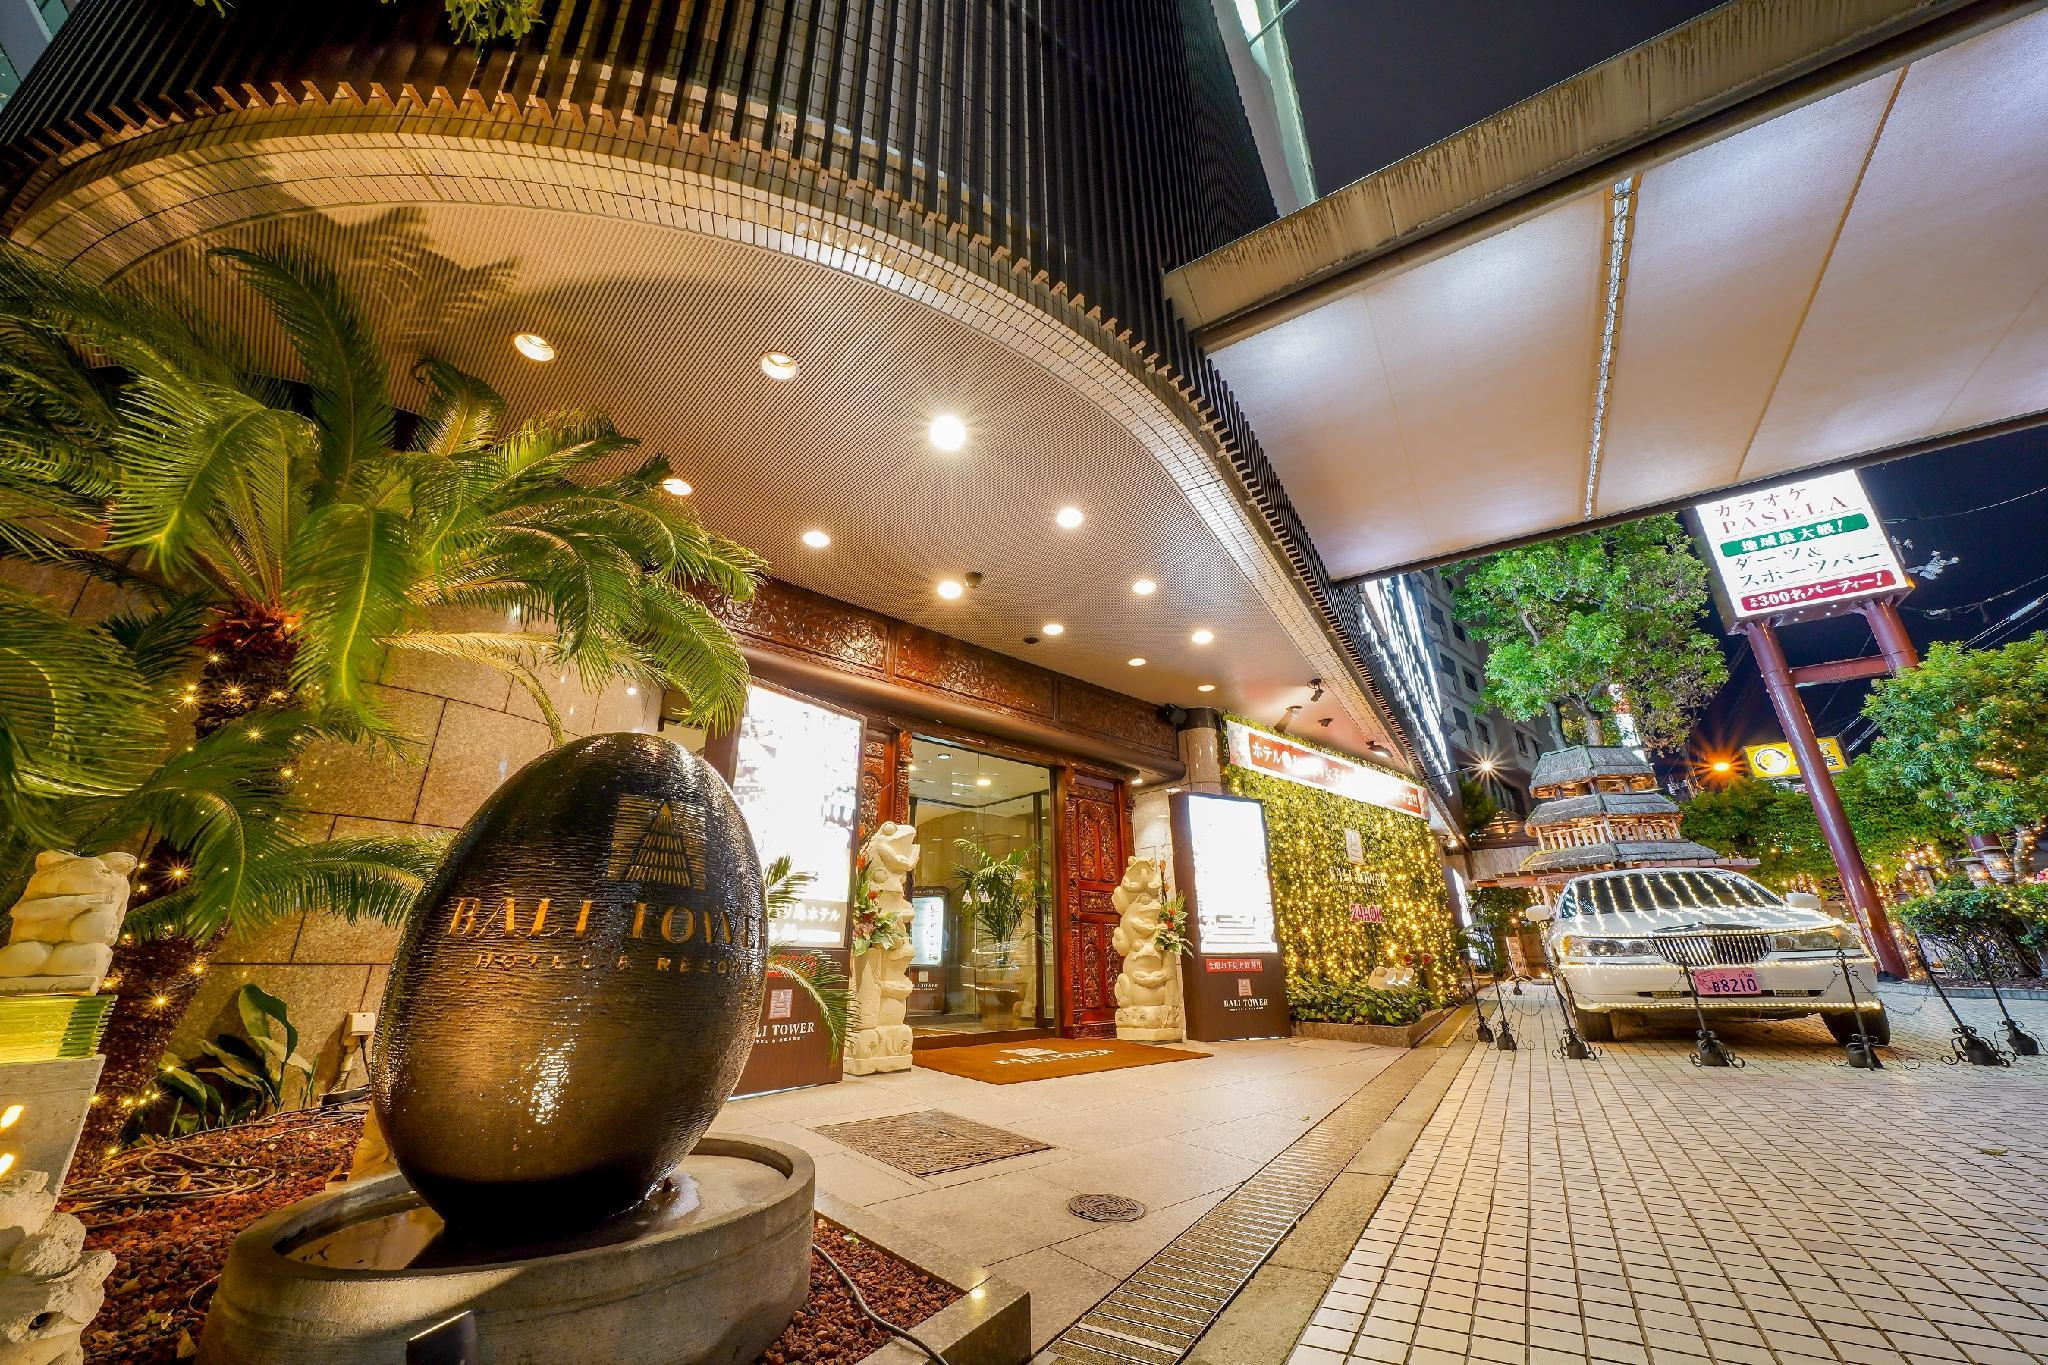 Hotel Bali Tower Tennoji